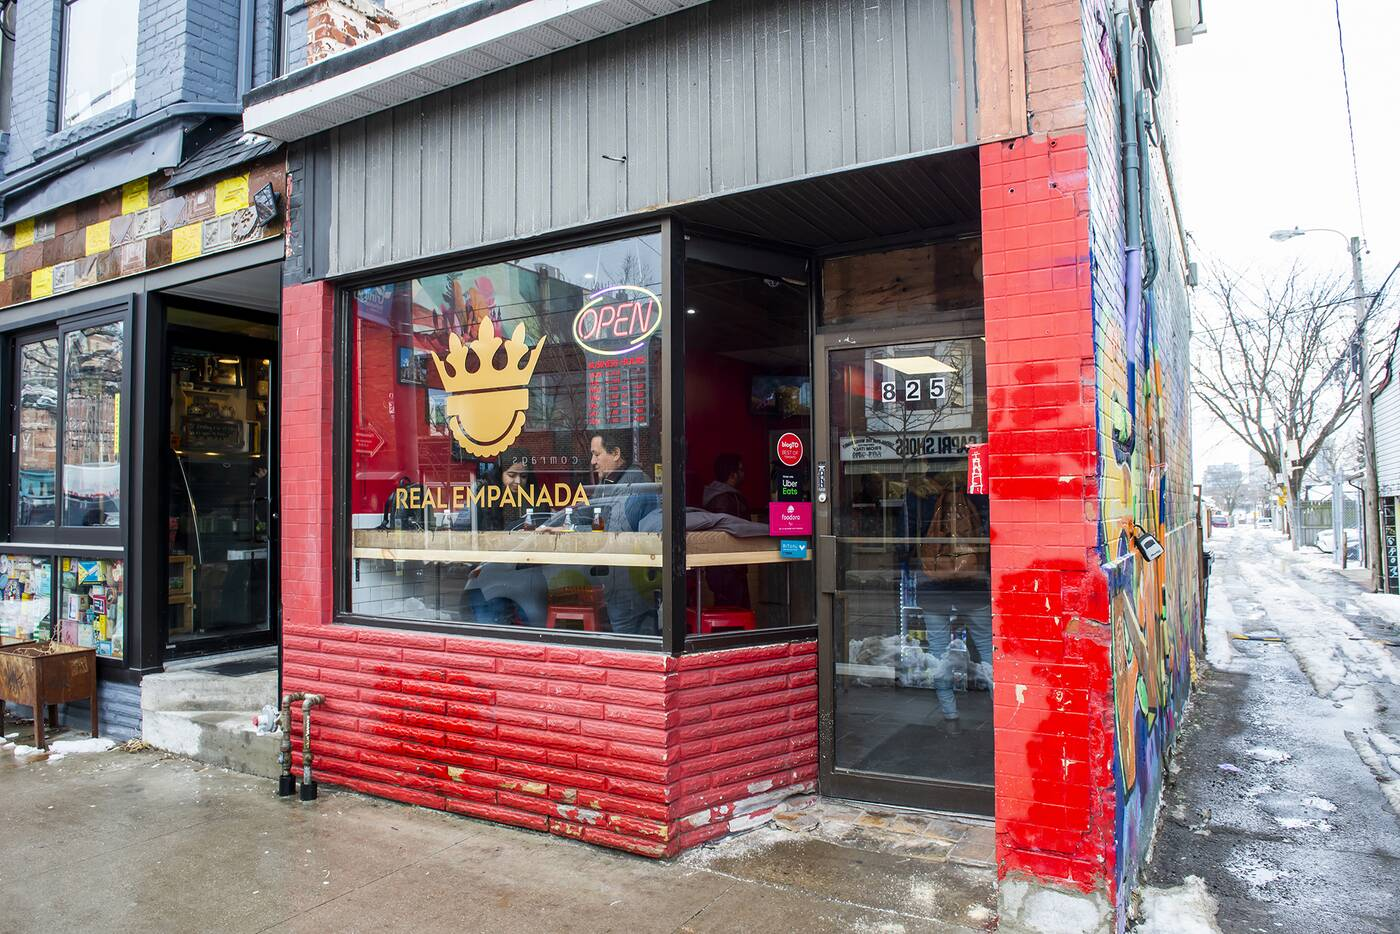 Real Empanada Corporation Toronto